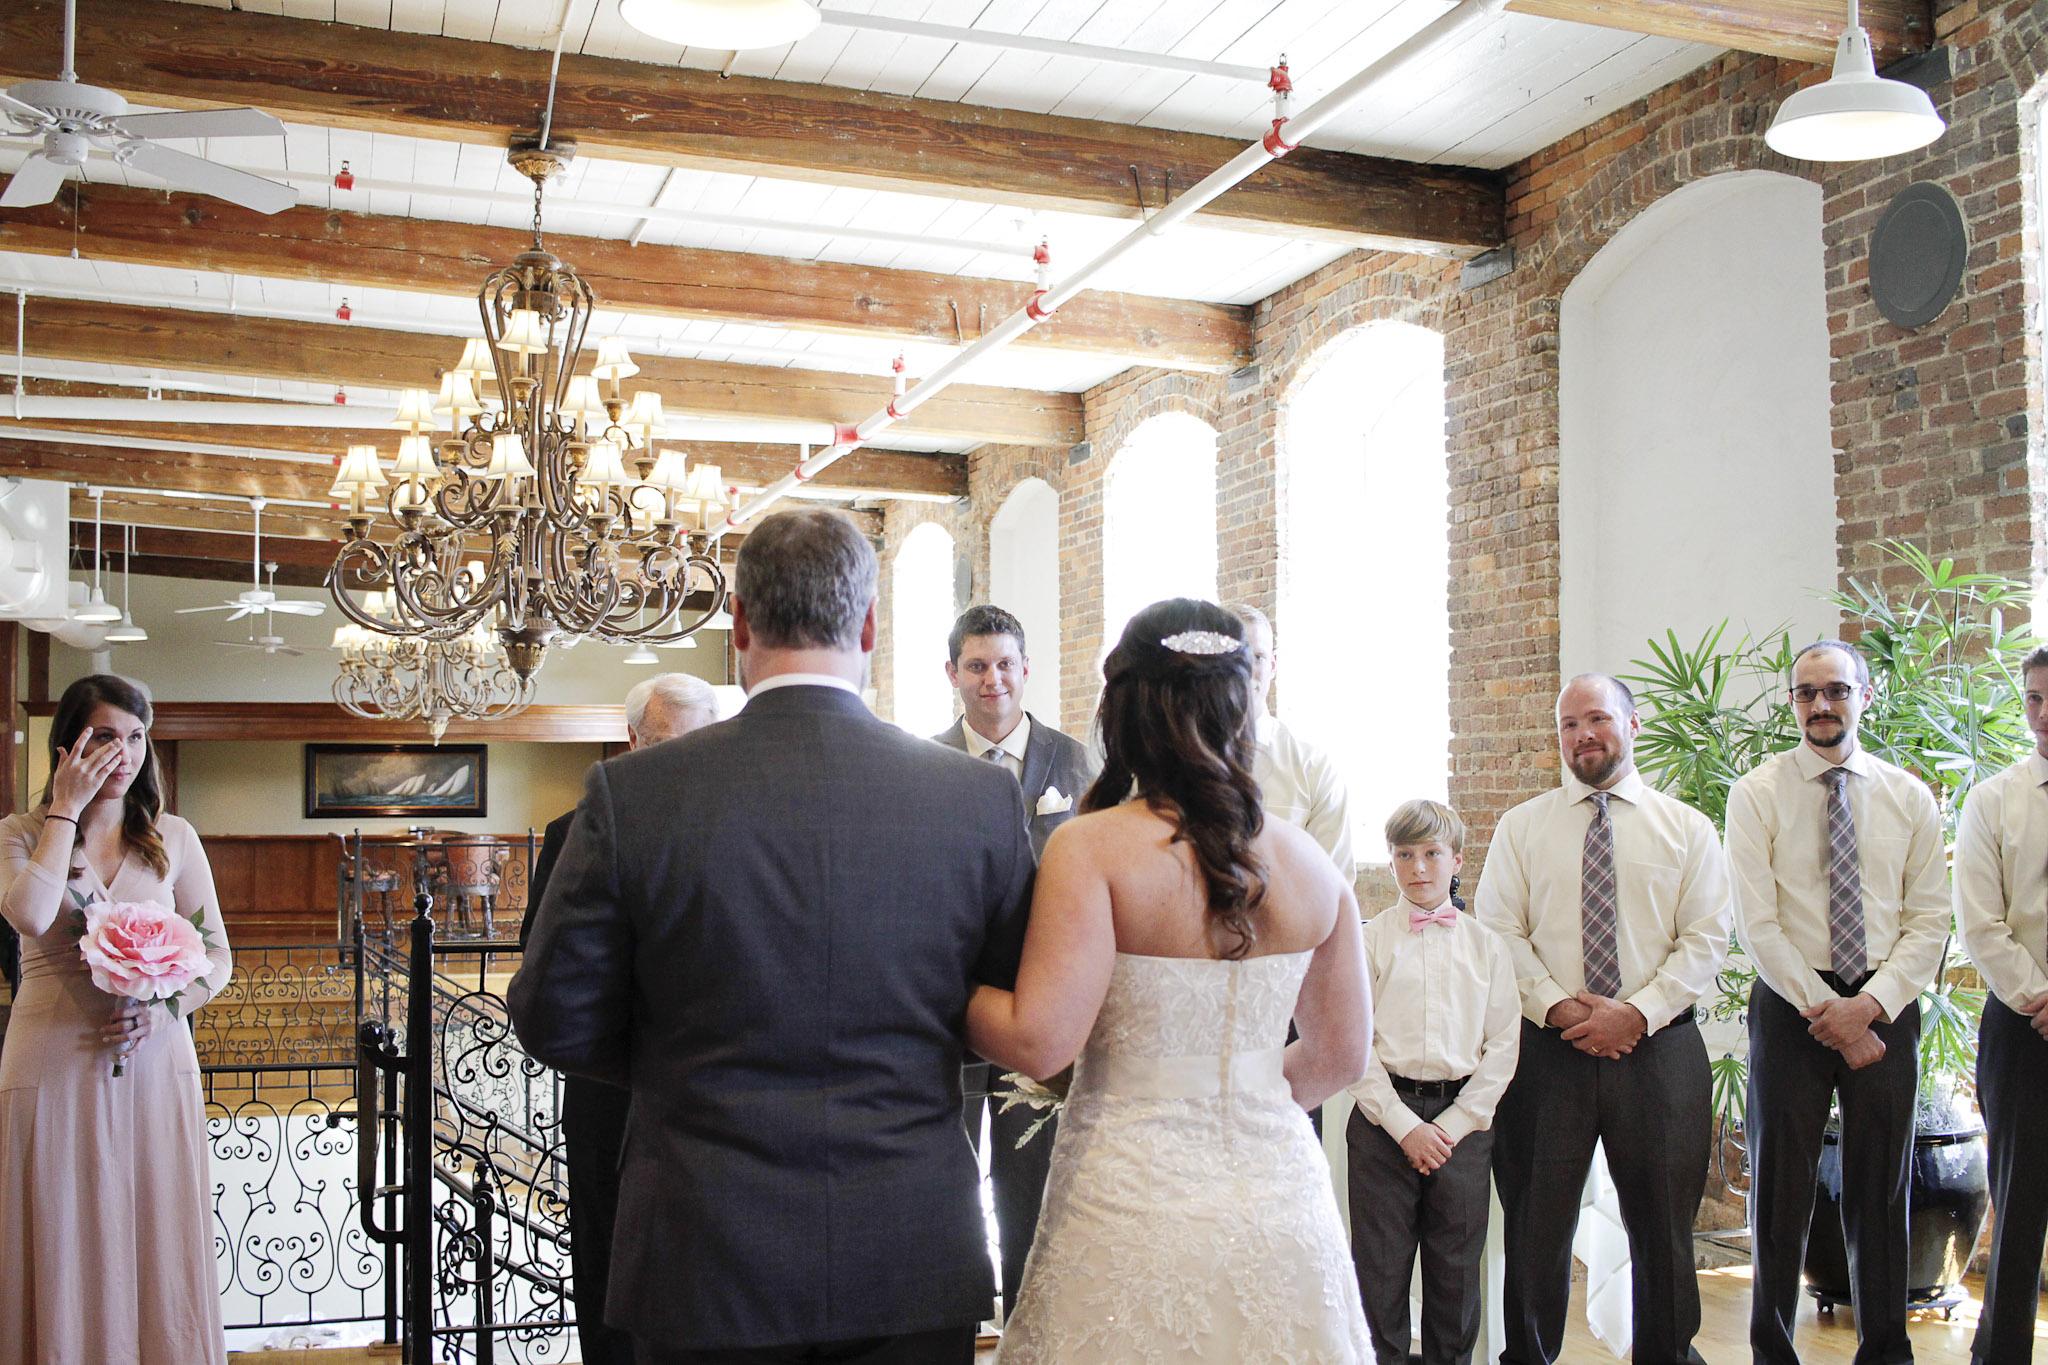 Revolution Mills Wedding by Kayli LaFon Photography in Greensboro Winston-Salem, North Carolina